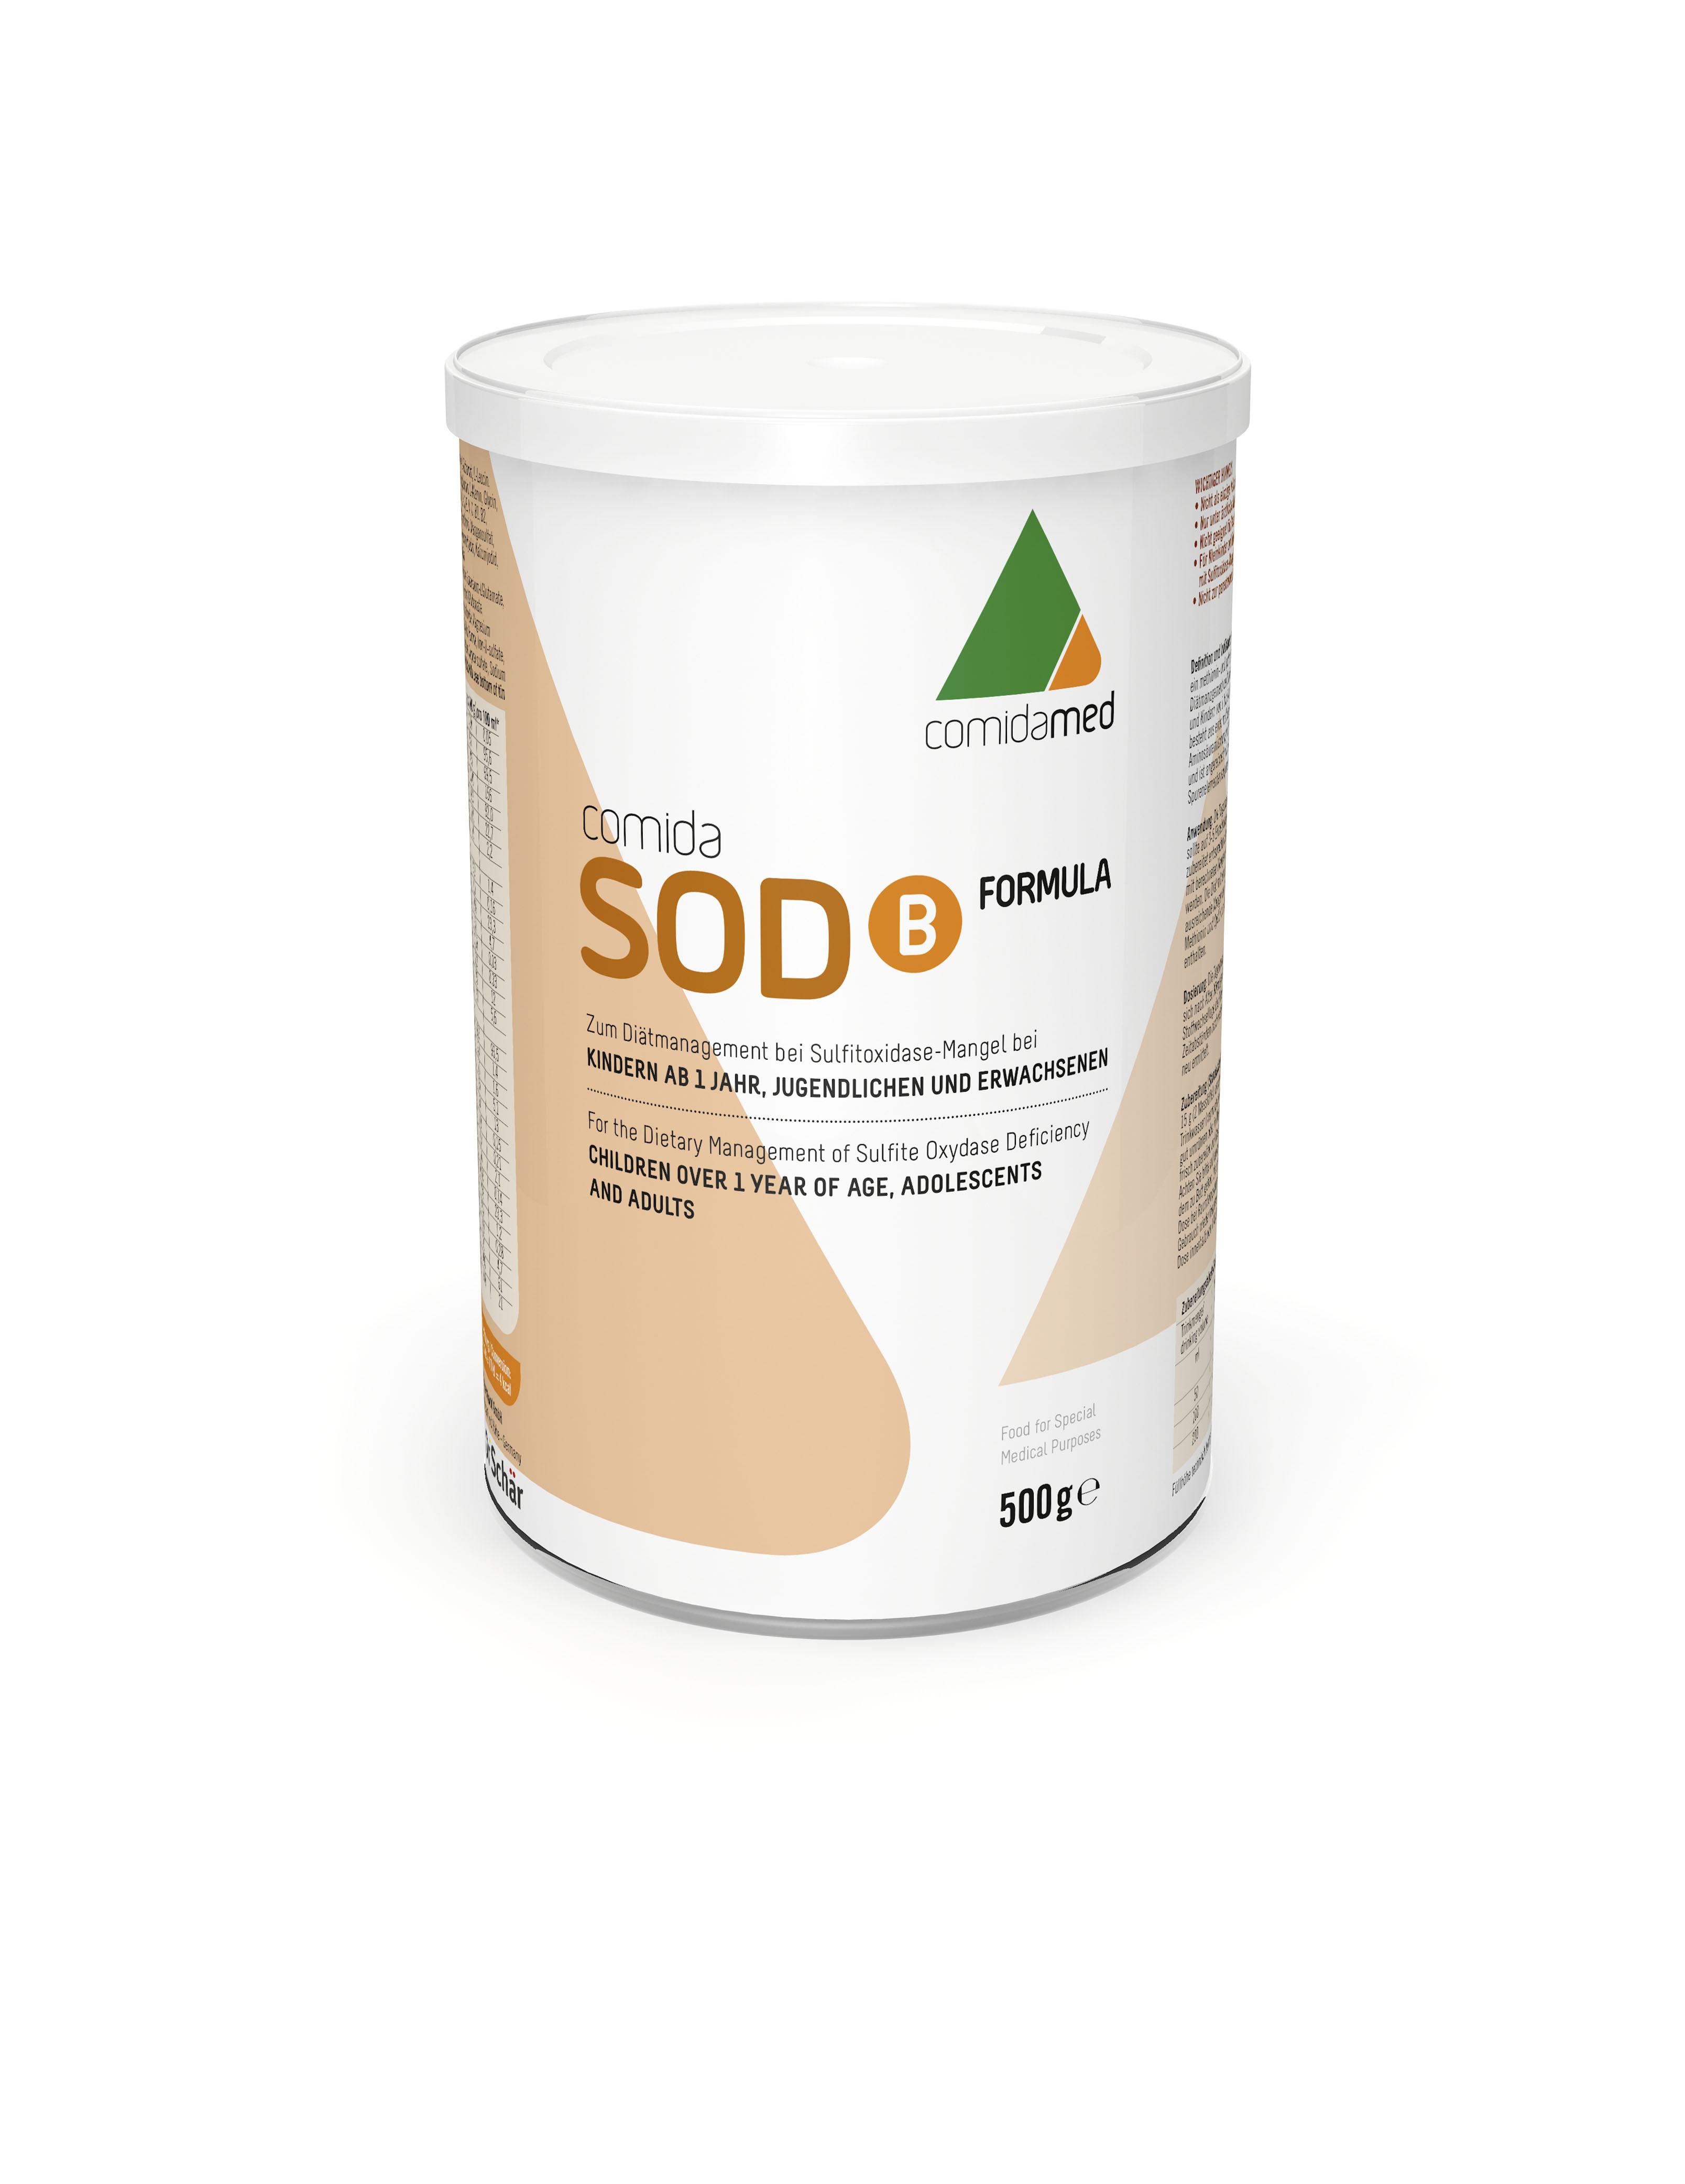 comida-SOD B FORMULA